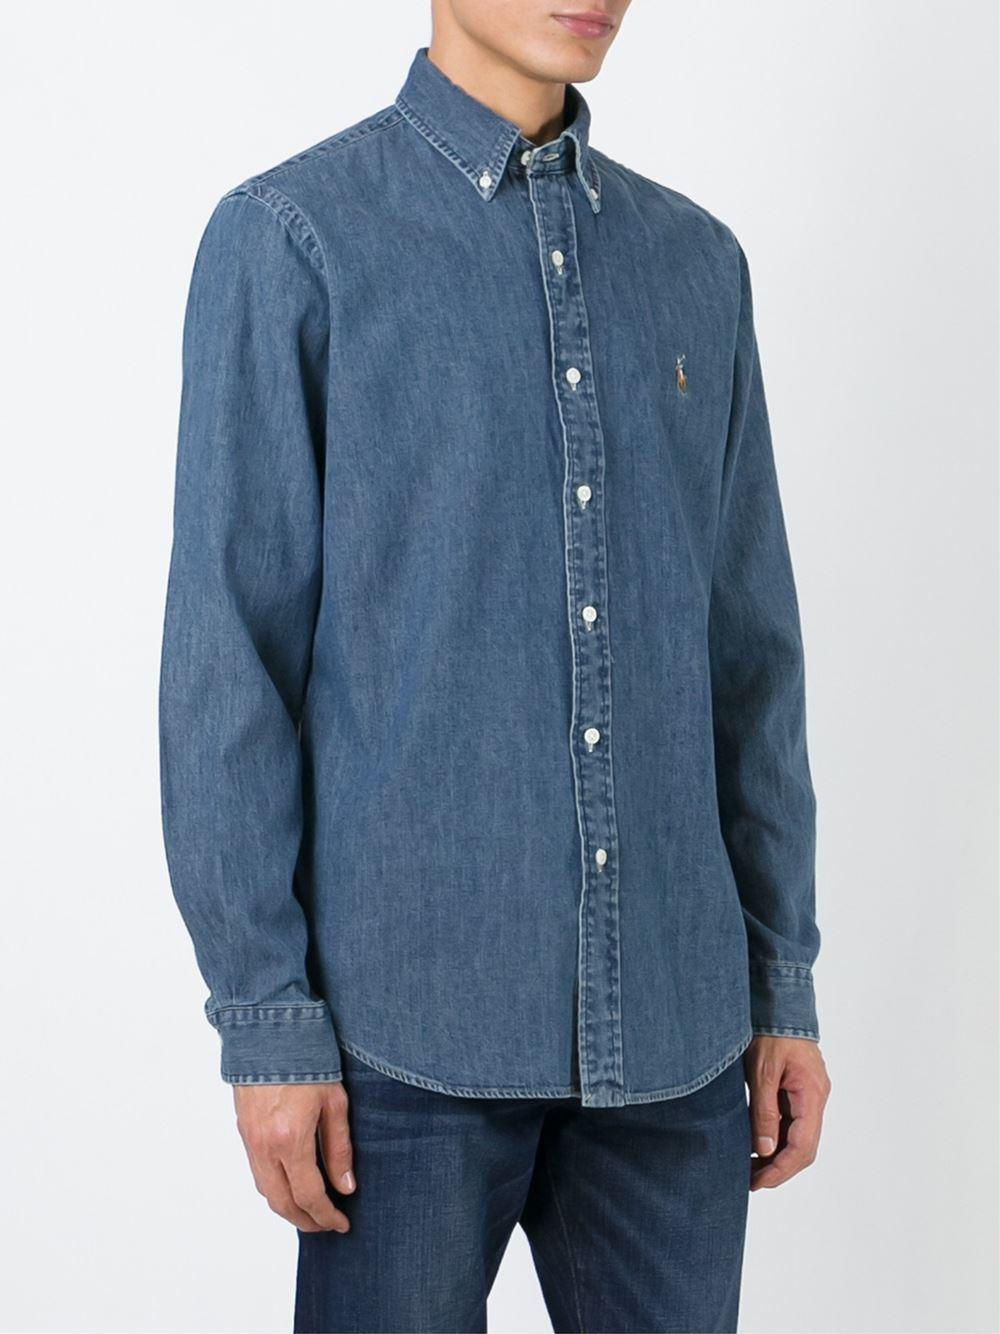 polo ralph lauren classic denim shirt in blue for men lyst